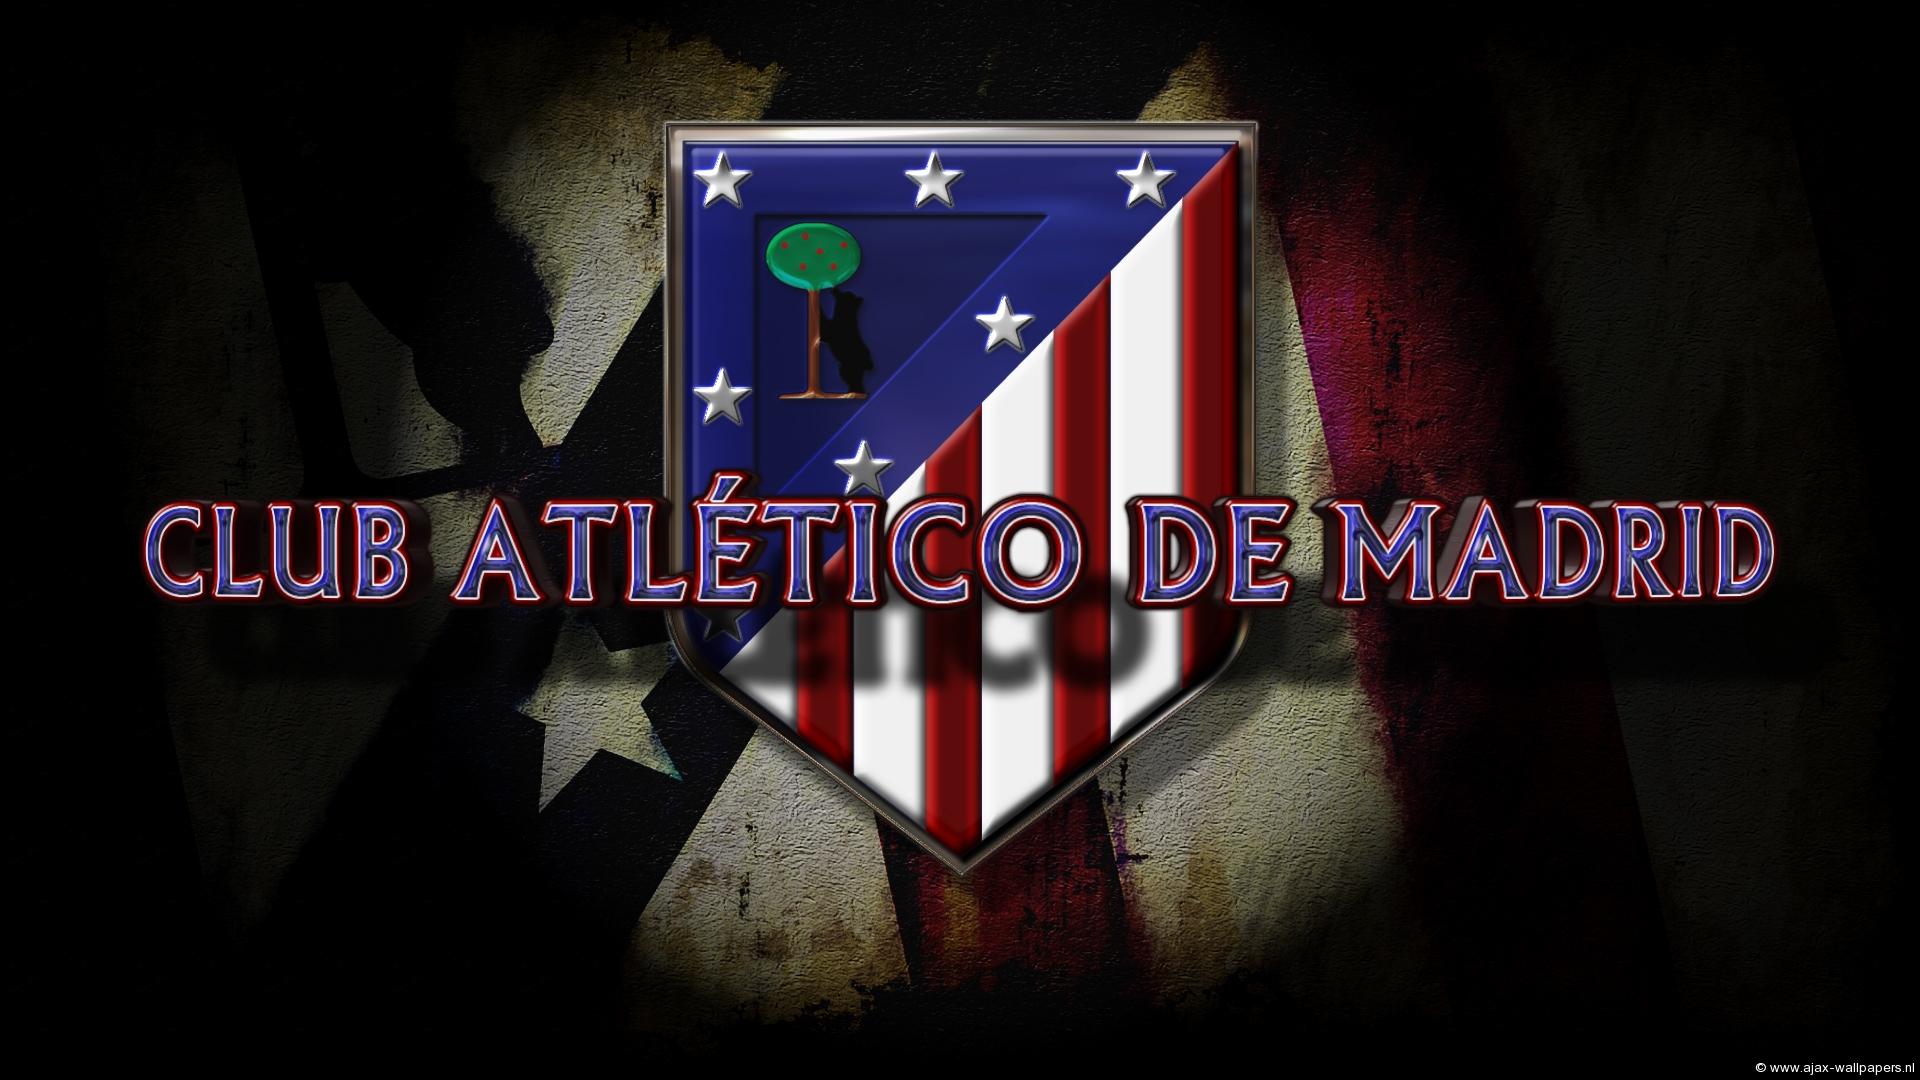 Club Atltico de Madrid Wallpaper   Football HD Wallpapers 1920x1080